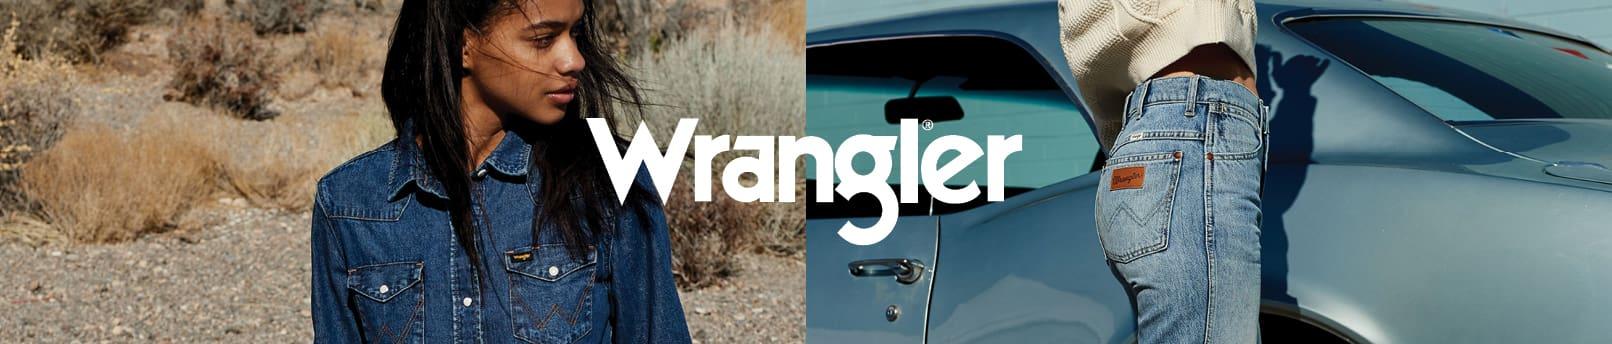 Découvrir Wrangler